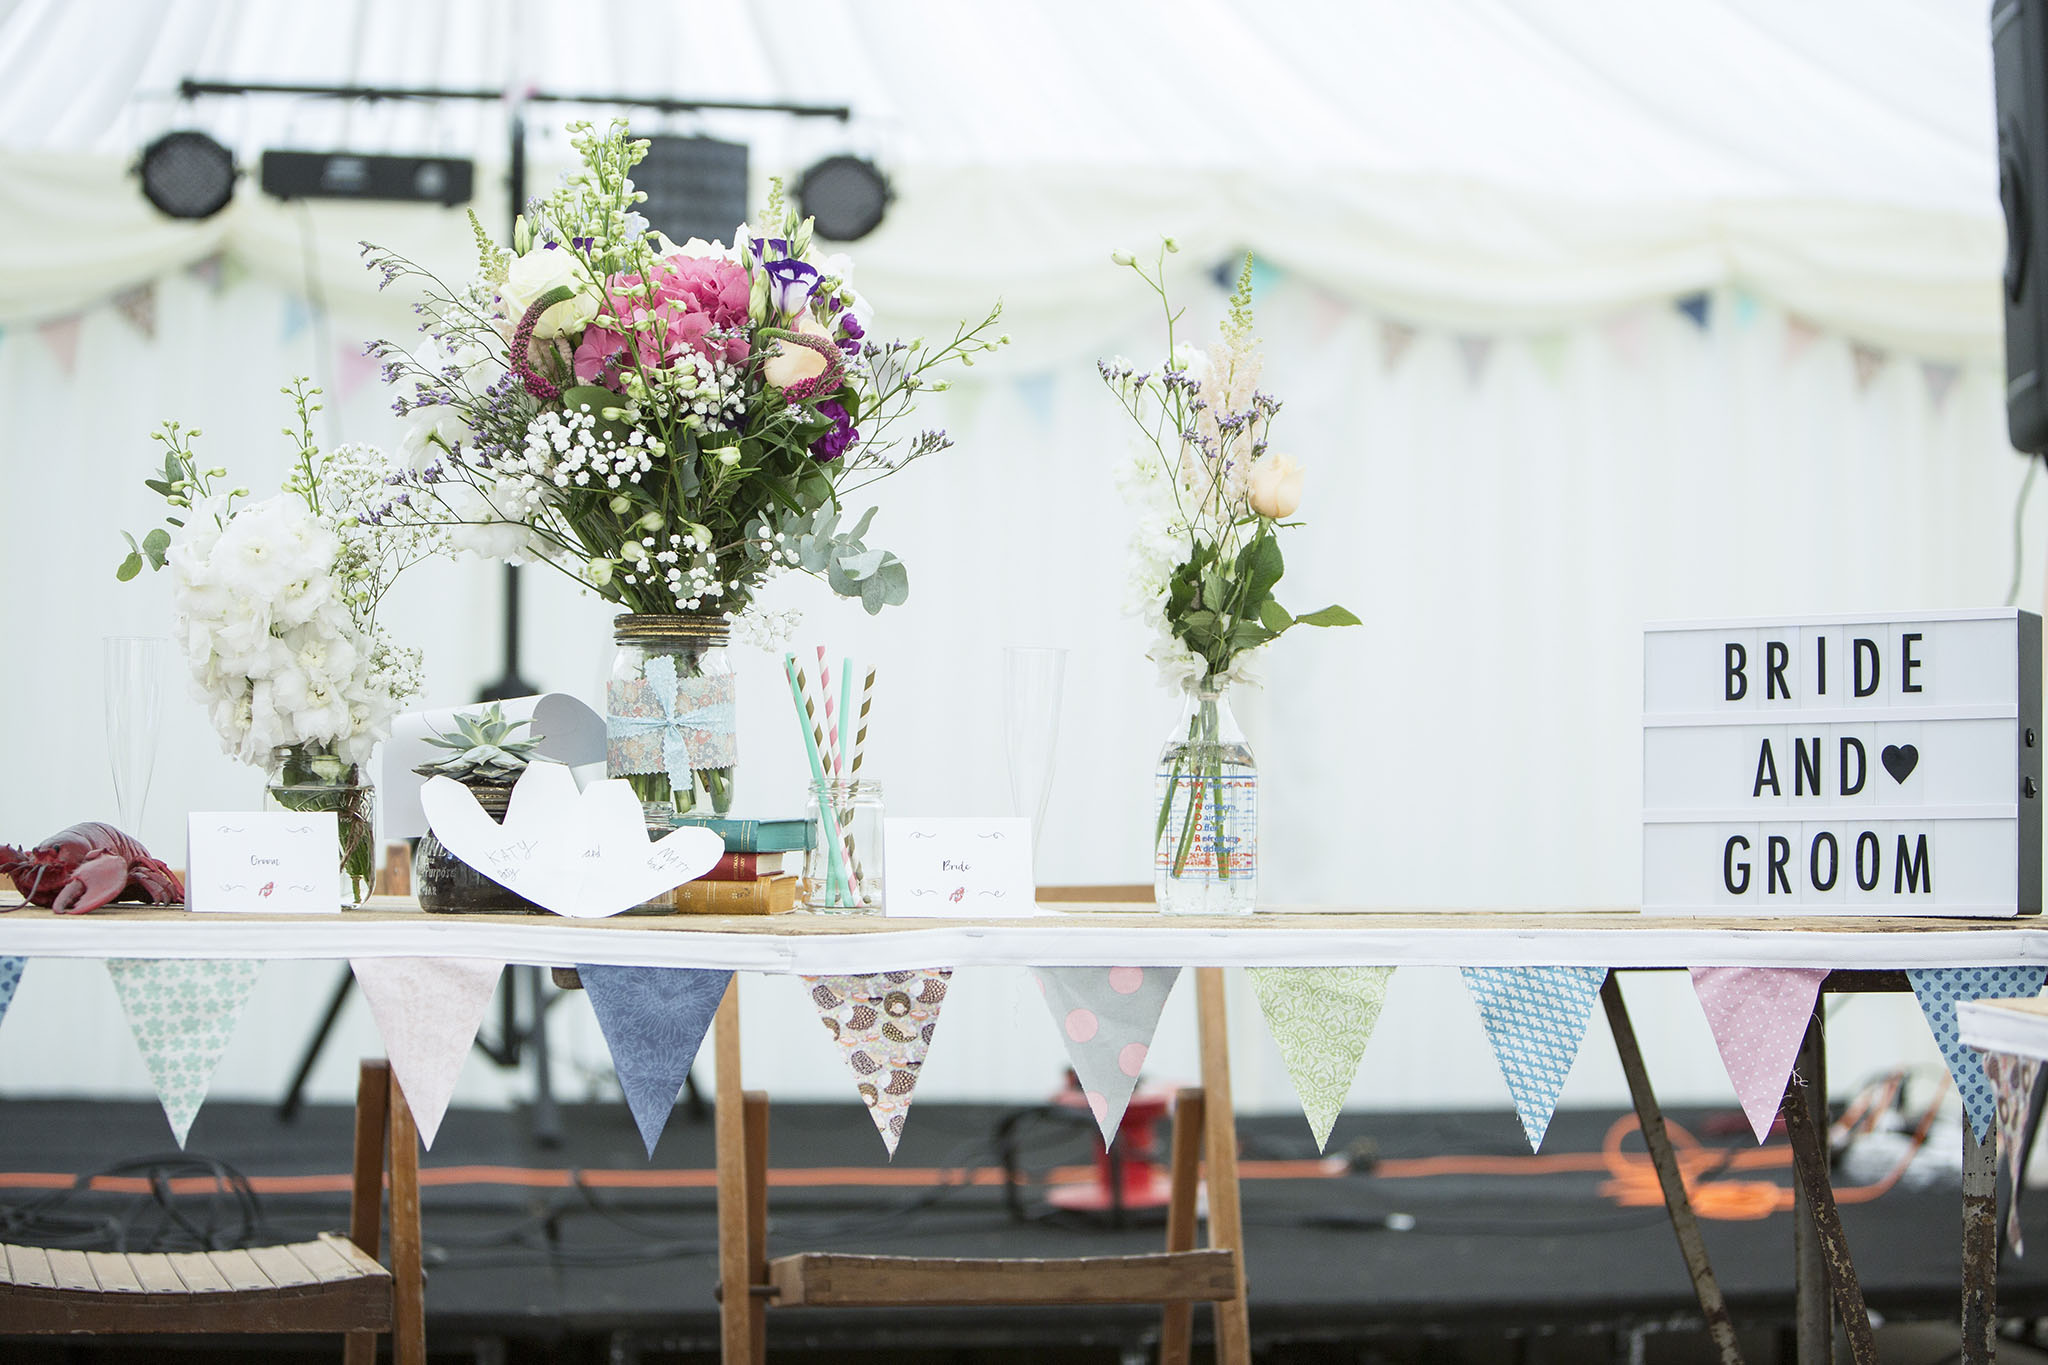 elizabethgphotography_kingslangley_hertfordshire_fineart_wedding_pottersbar_matt_katie_pegg_02.jpg